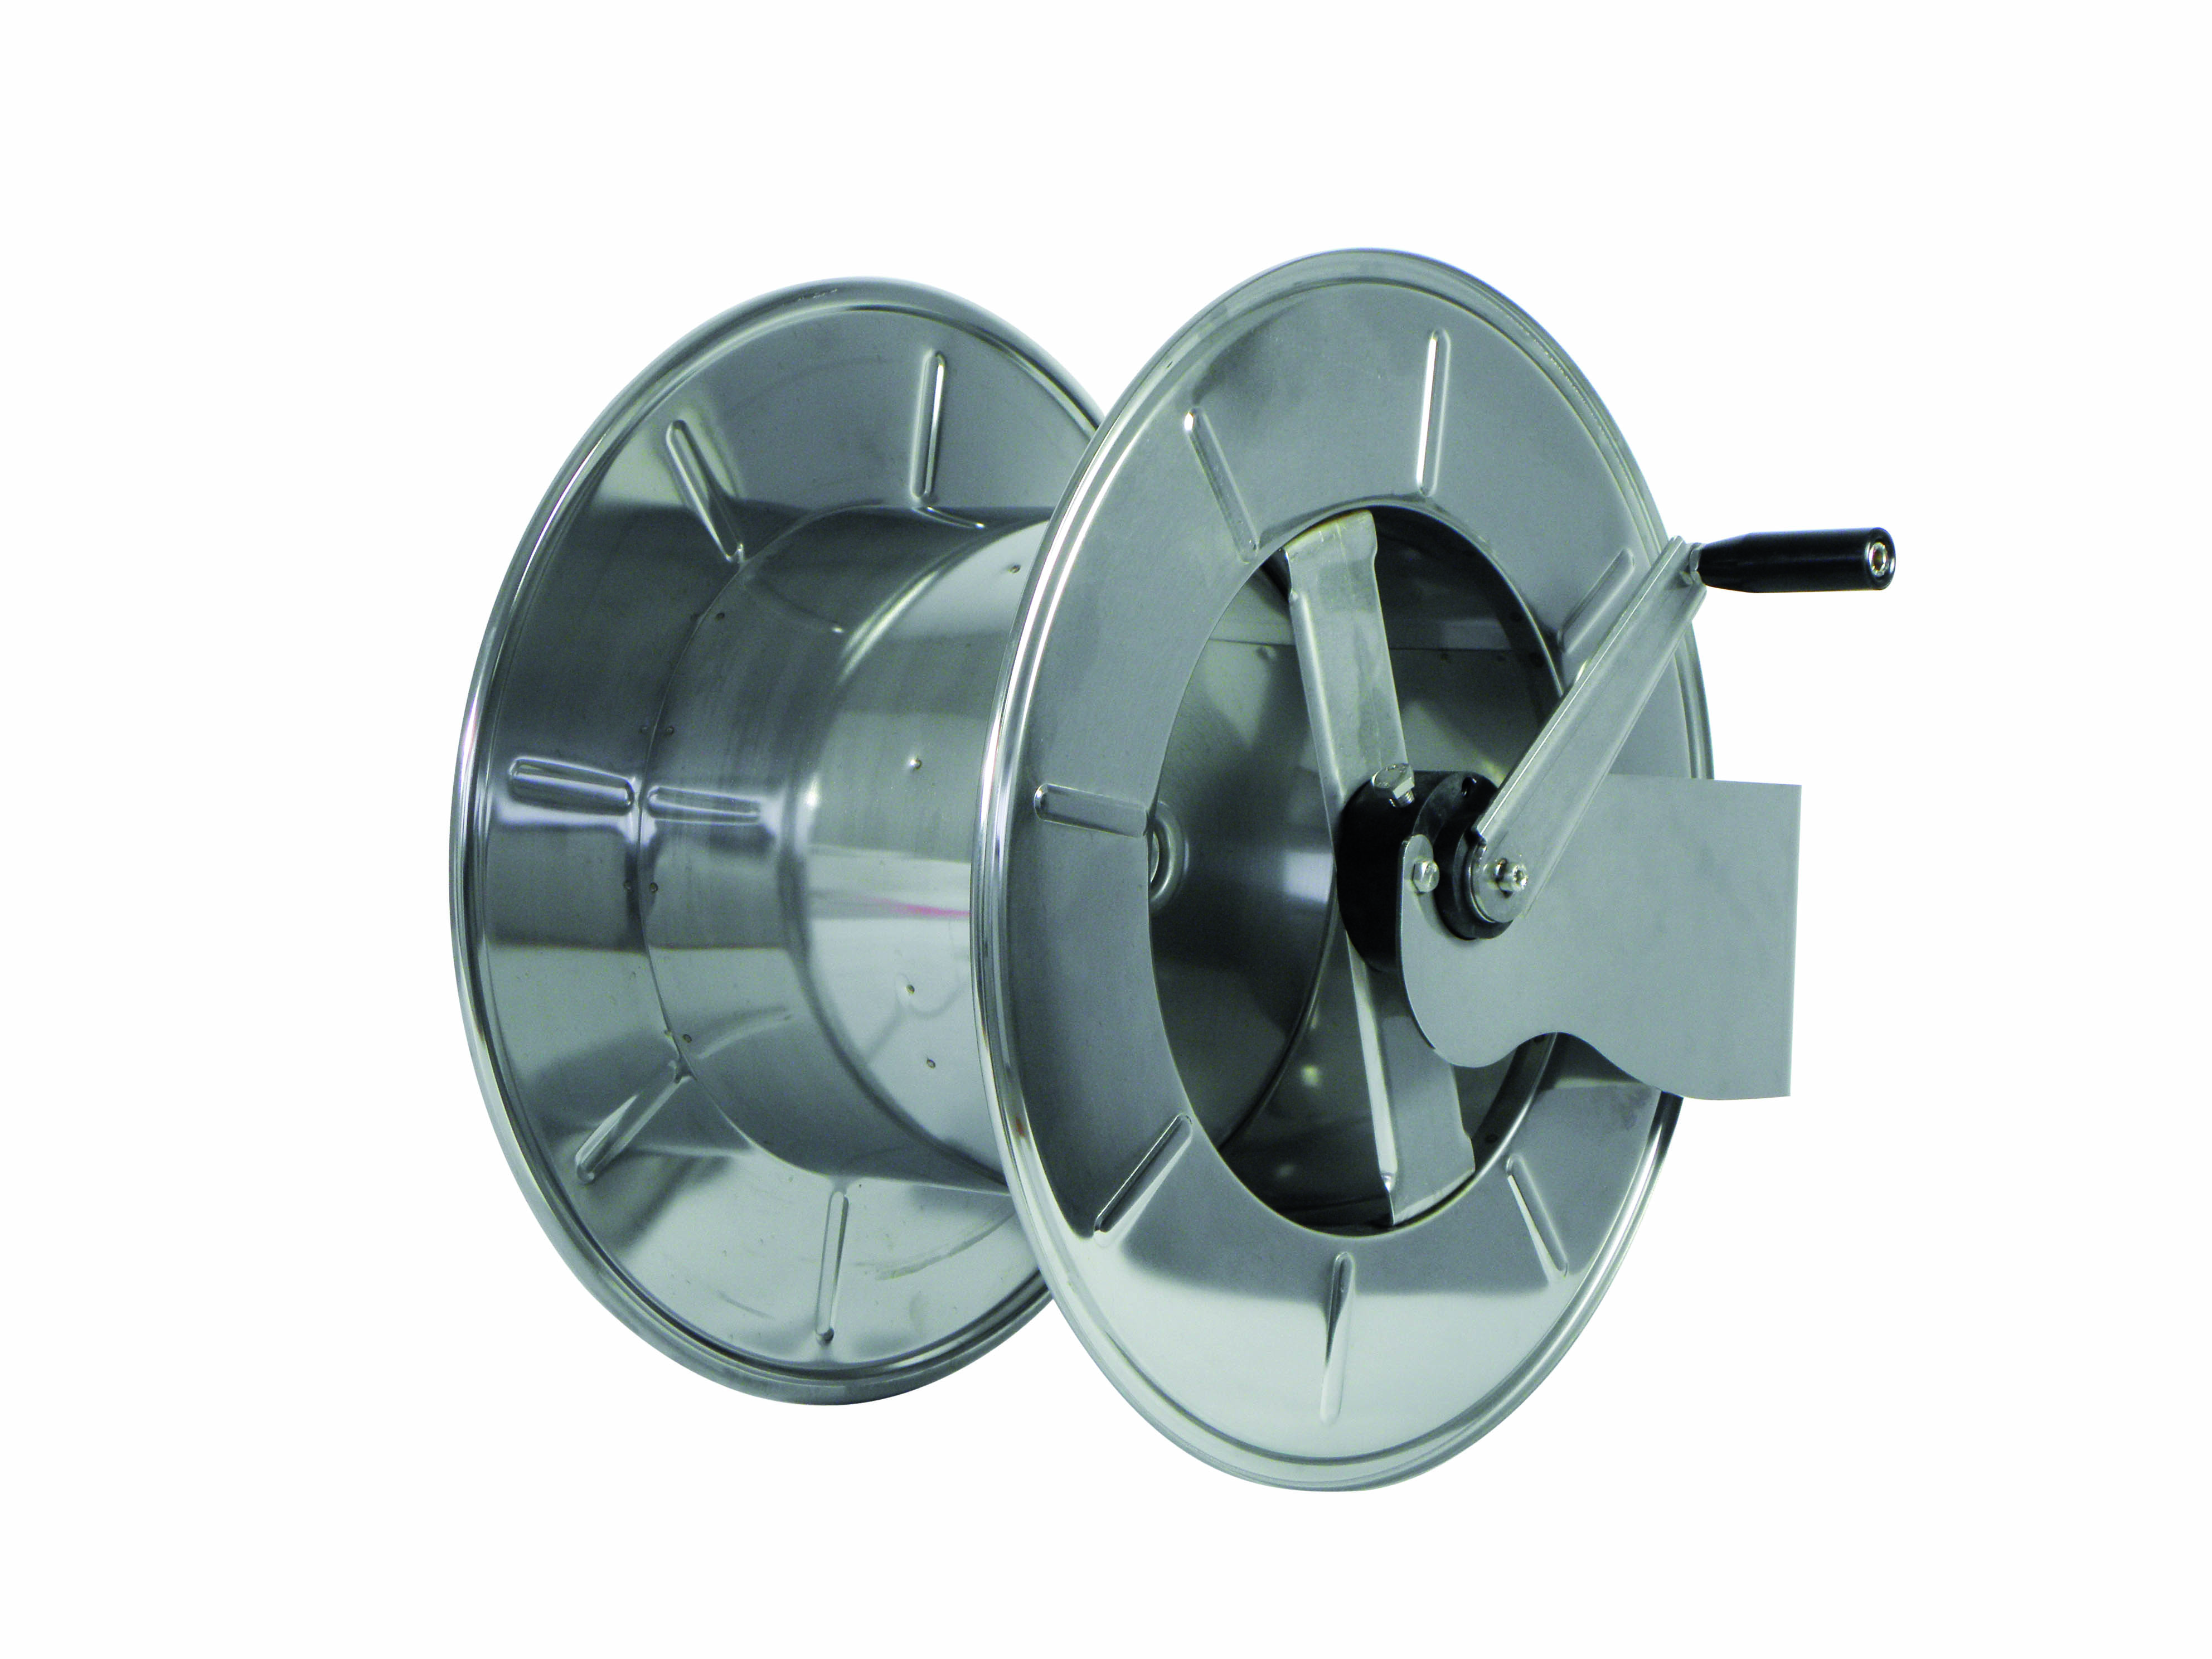 AVM9940 - Carretes de manguera para agua - Presion 0-200 Bar / 0-2900 PSI